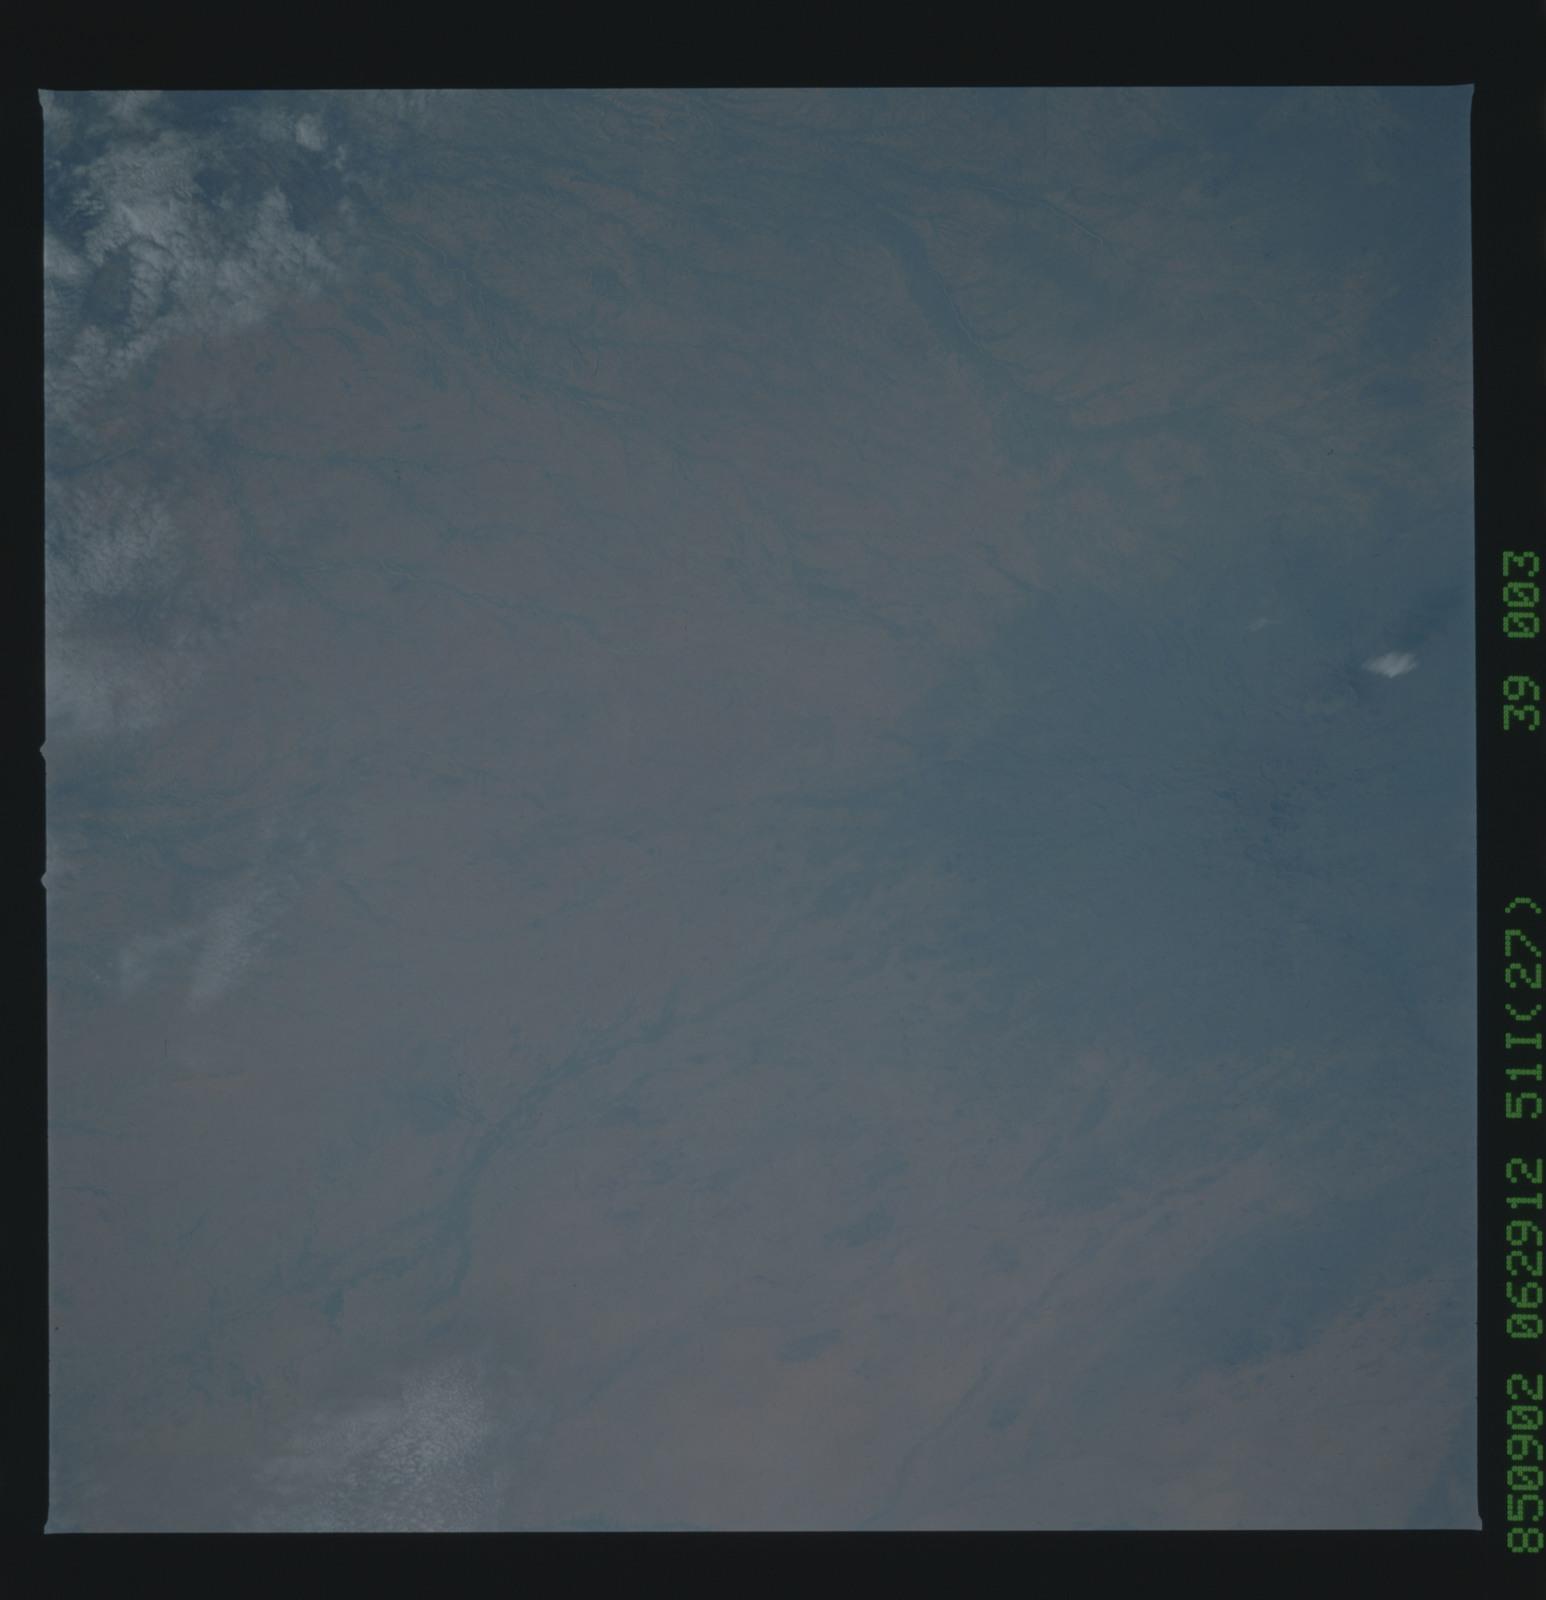 51I-39-003 - STS-51I - STS-51I earth observations